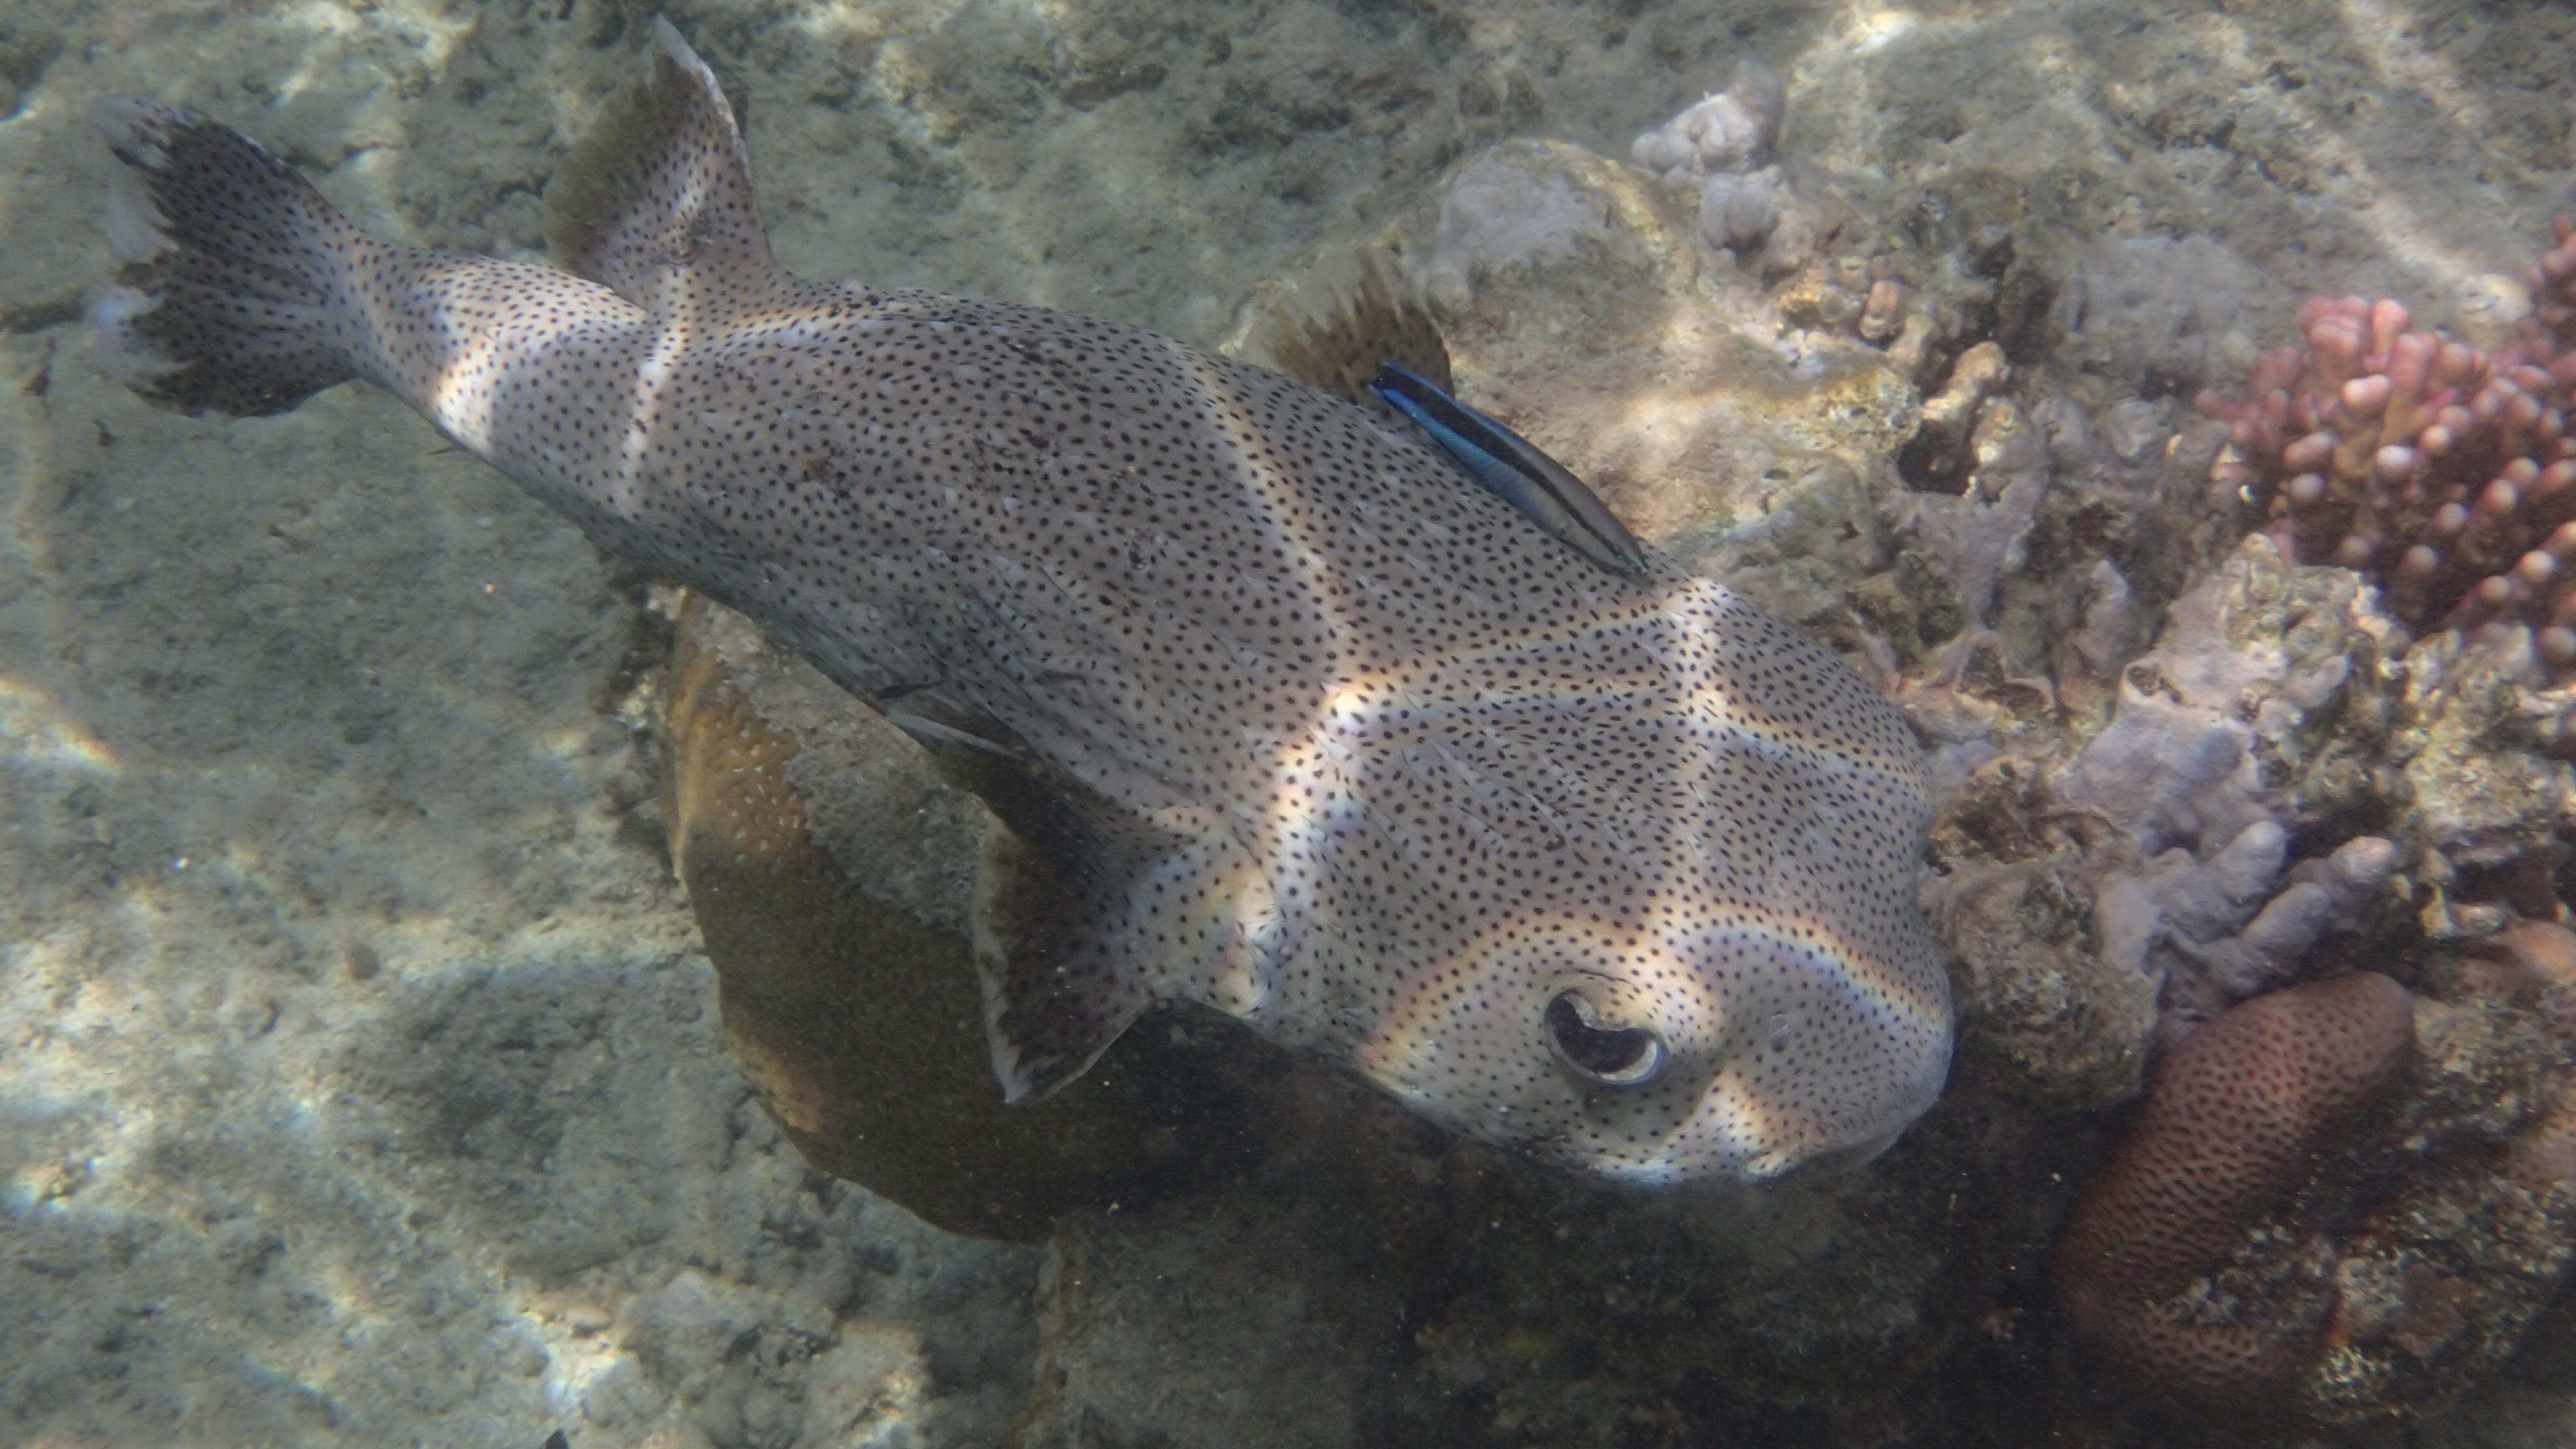 Длинношипая рыба-ёж (лат.Diodon hystrix, англ.Spot-fin porcupinefish)